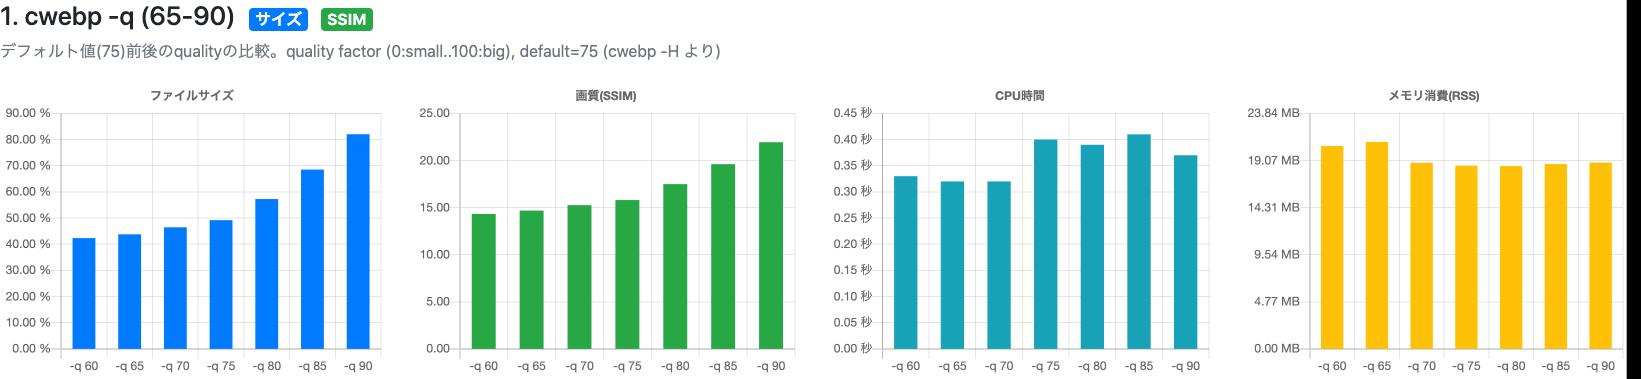 webp-param-detail-chart.png